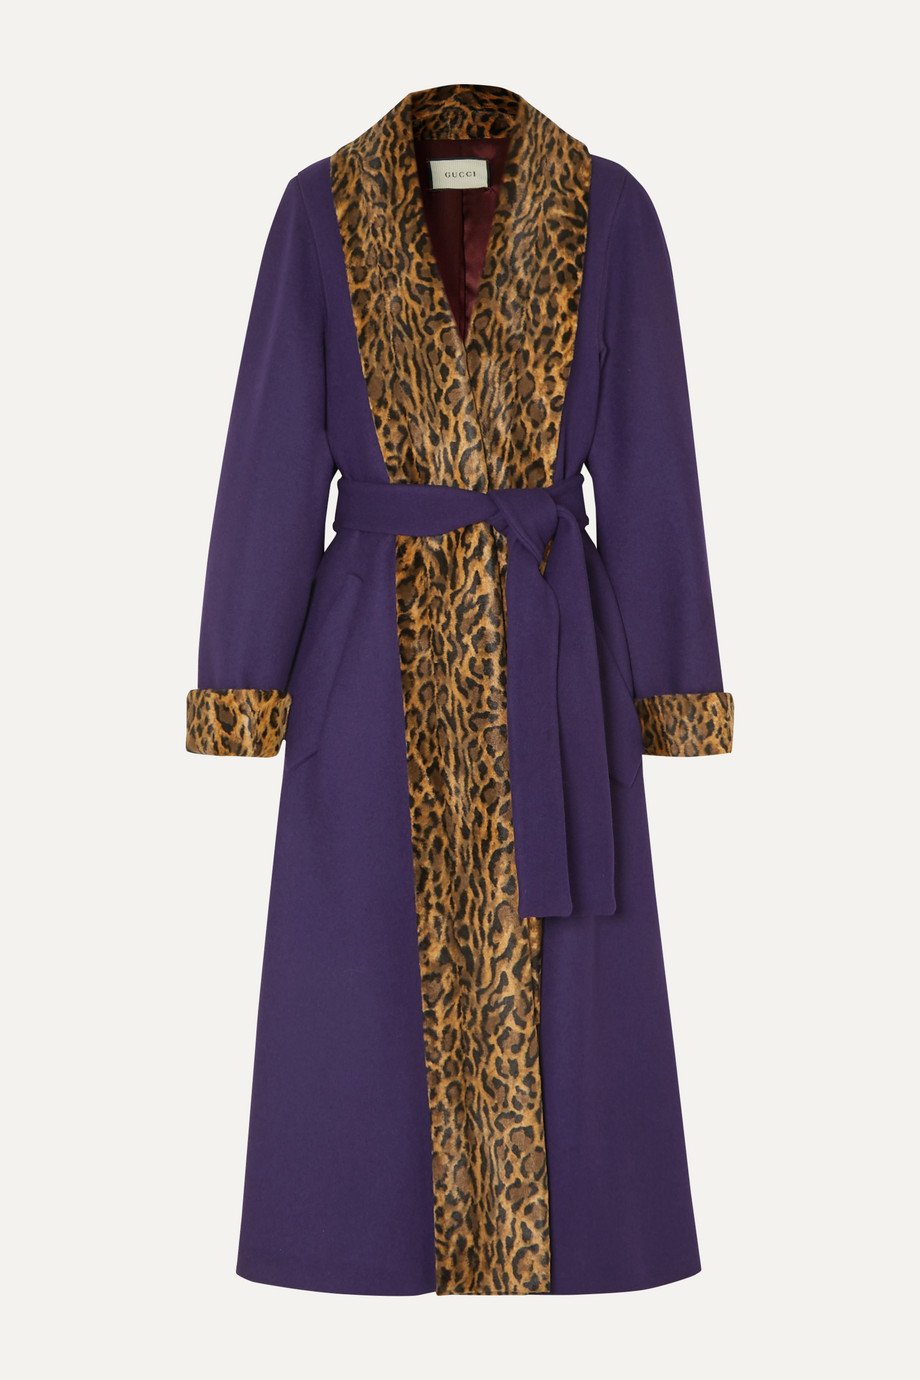 Gucci Leopard-print faux fur-trimmed wool-blend coat